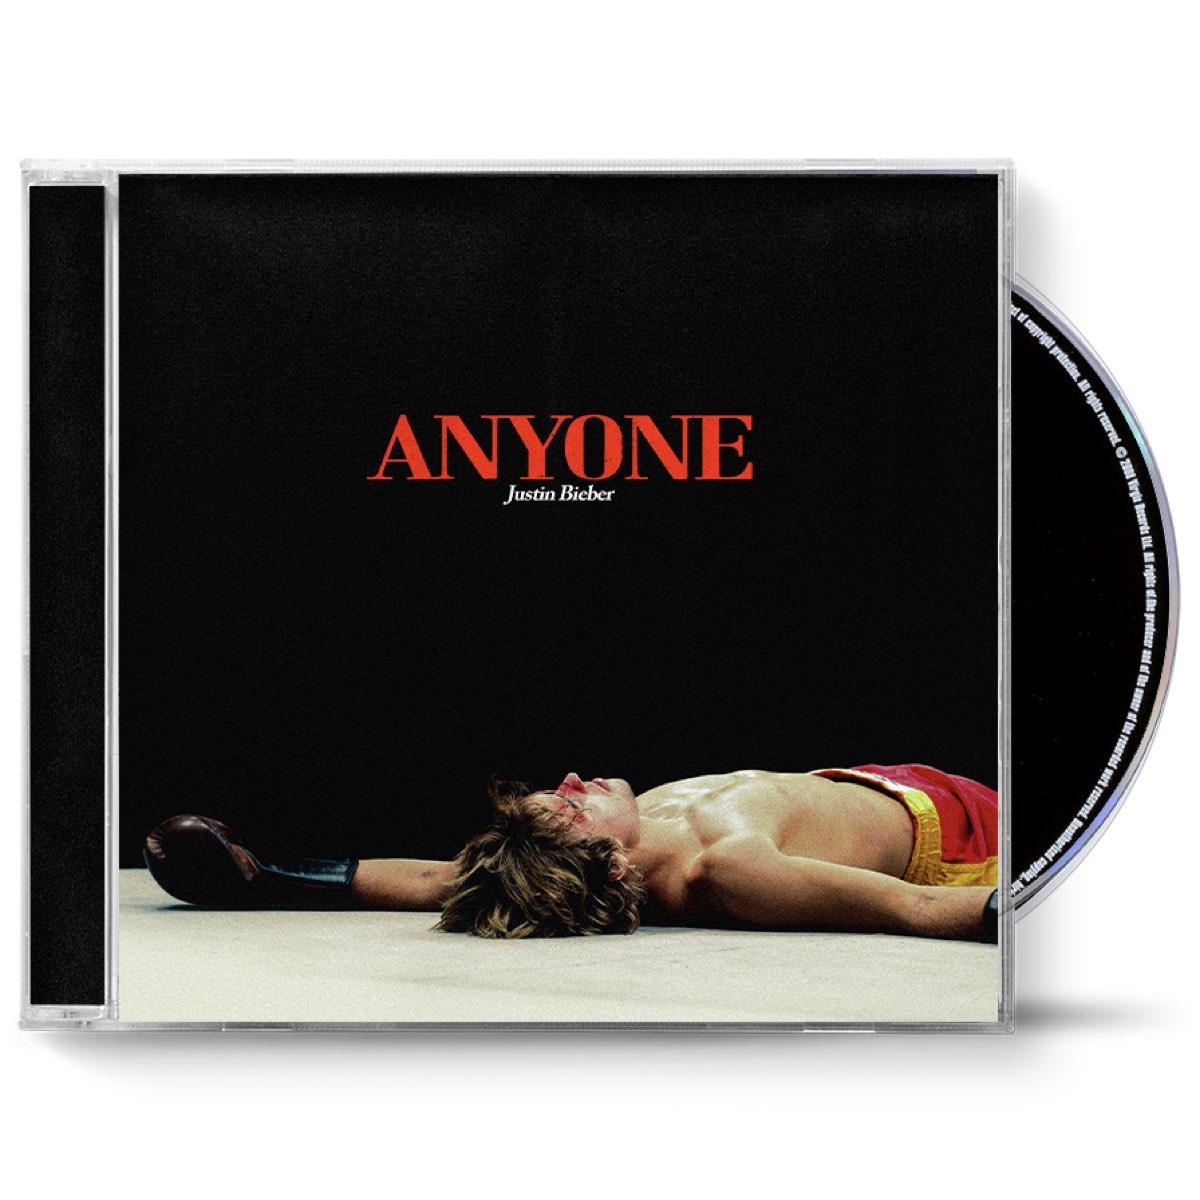 Justin Bieber - Anyone [CD Single]